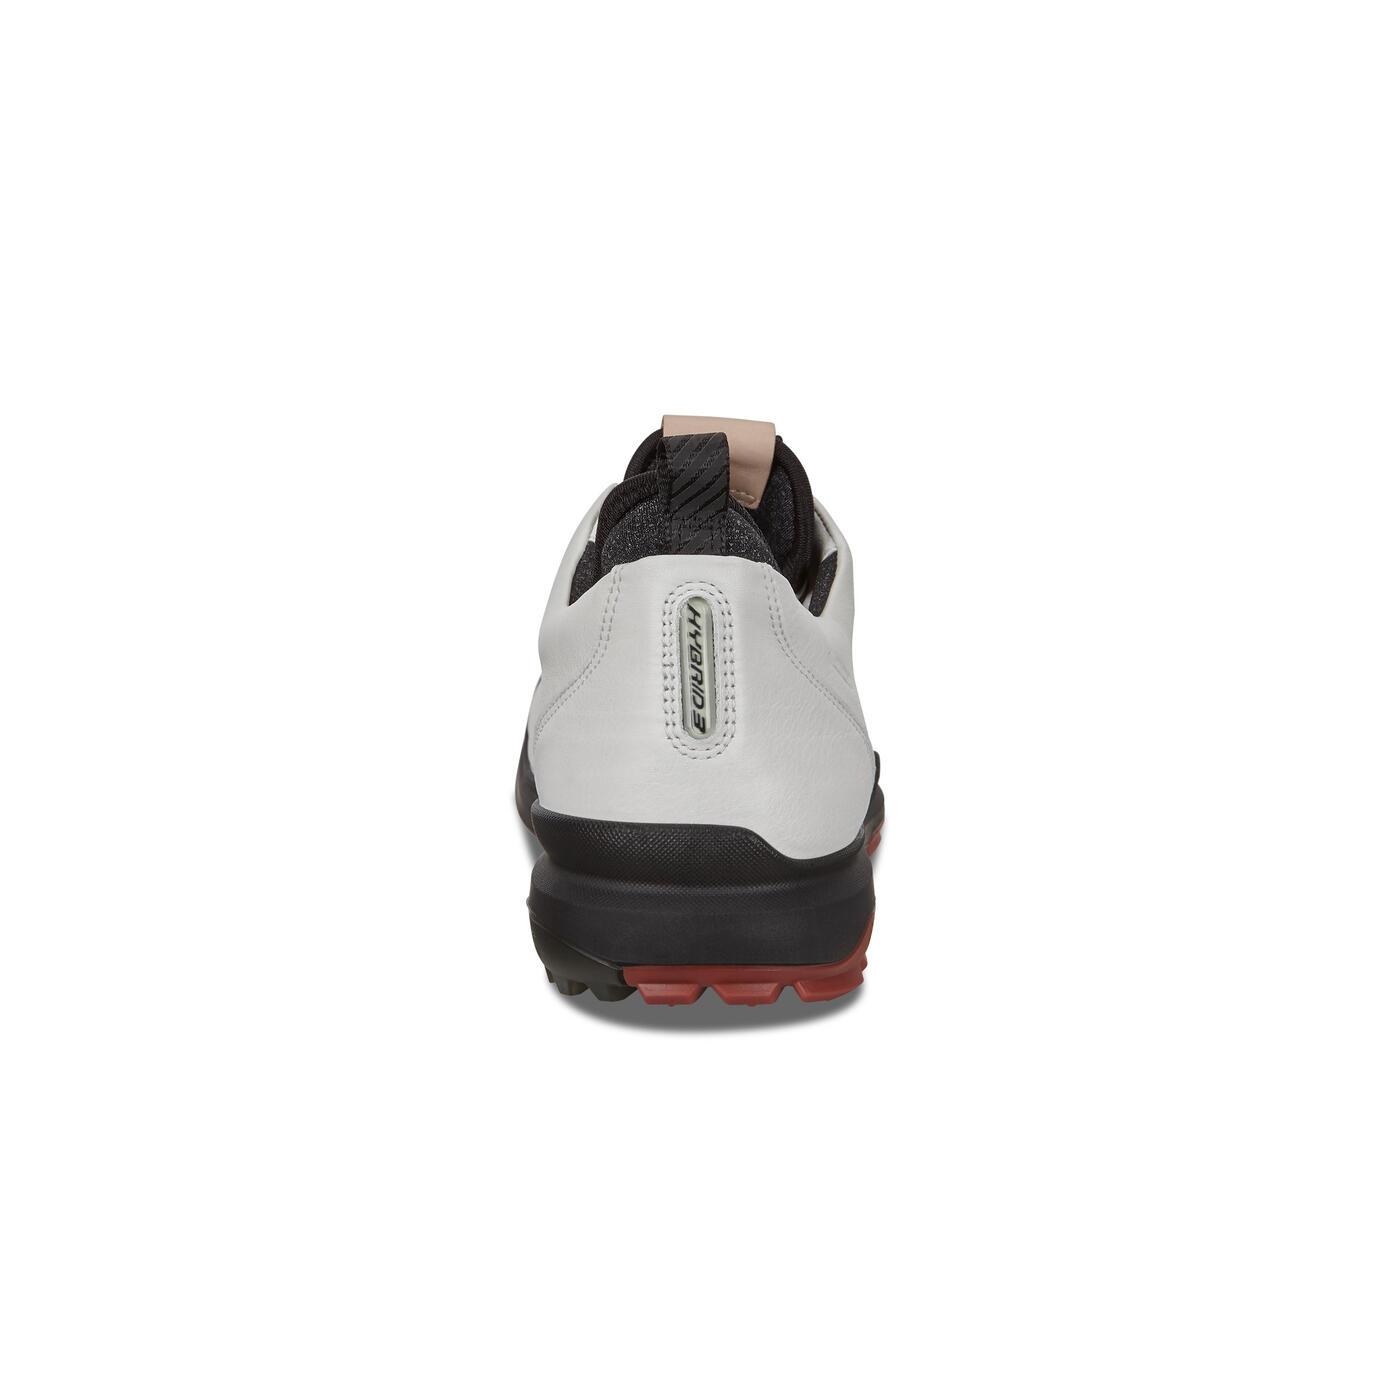 ECCO M GOLF BIOM HYBRID 3 Shoe